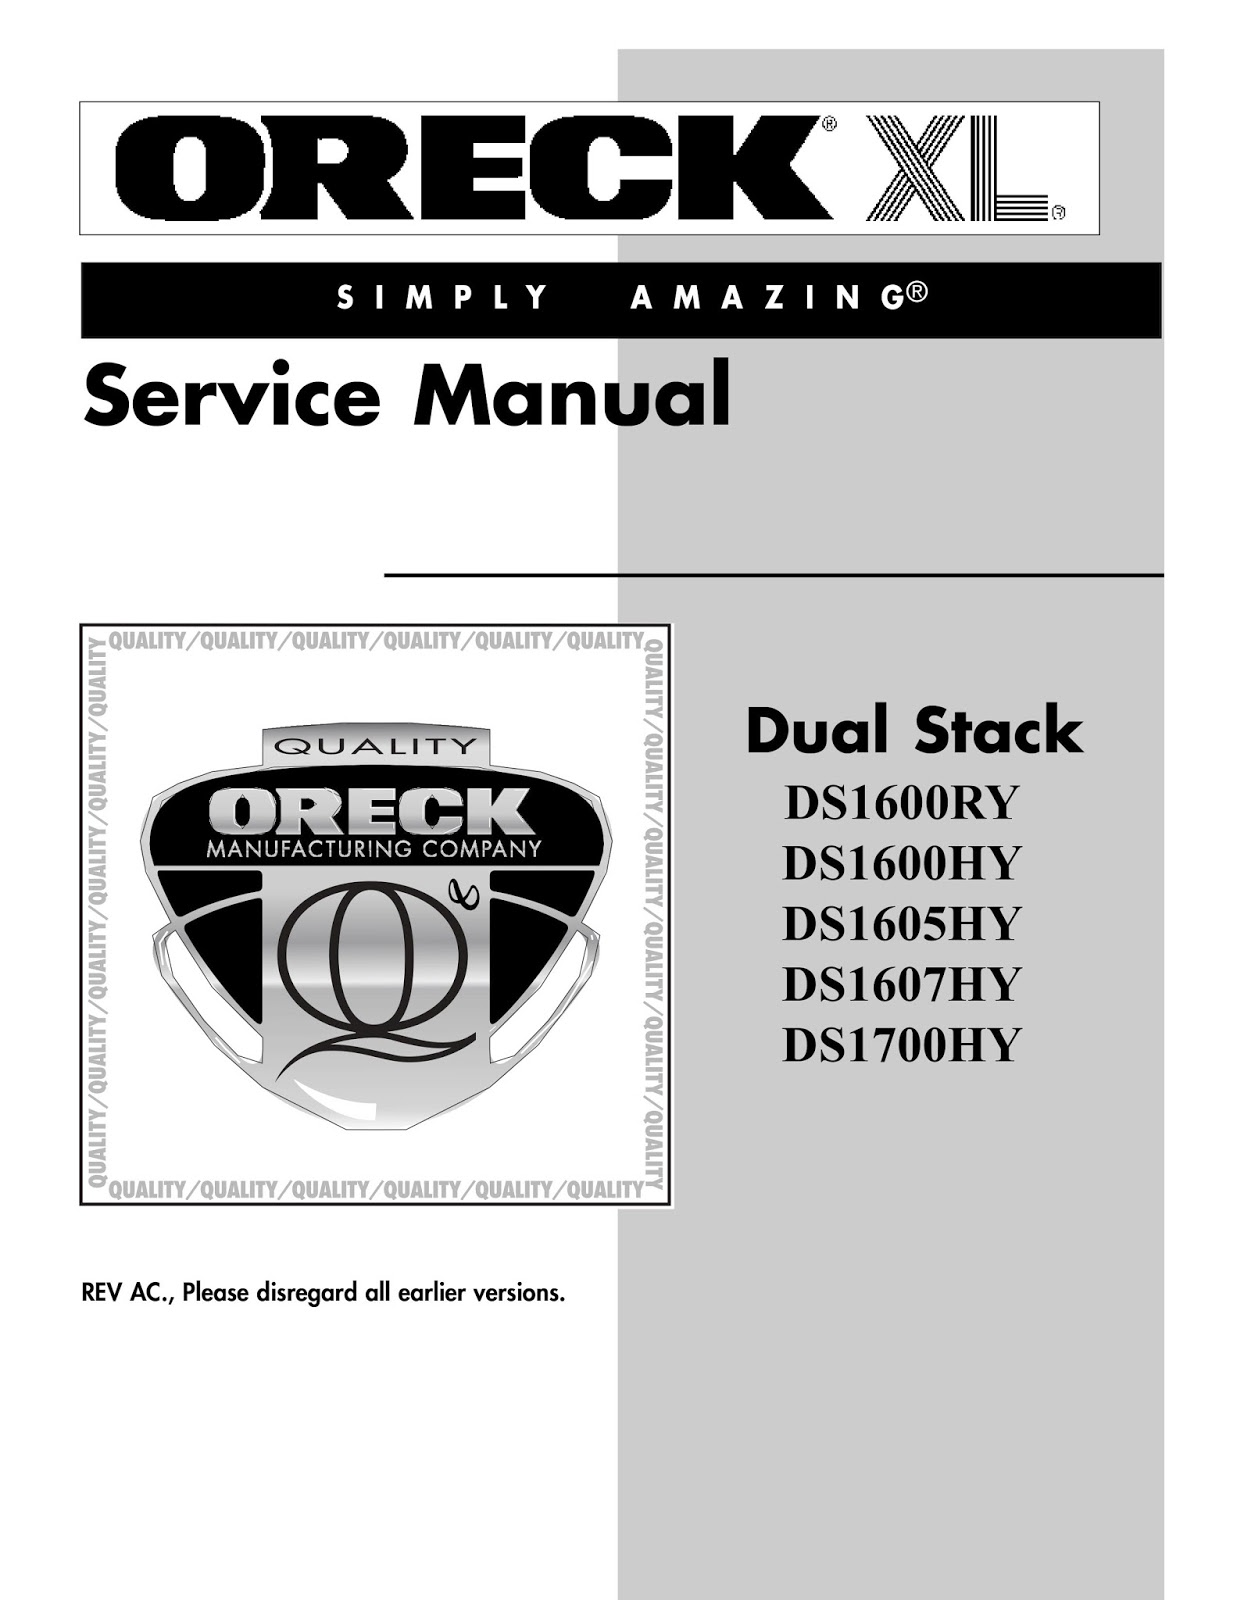 medium resolution of oreck dual stack service manual